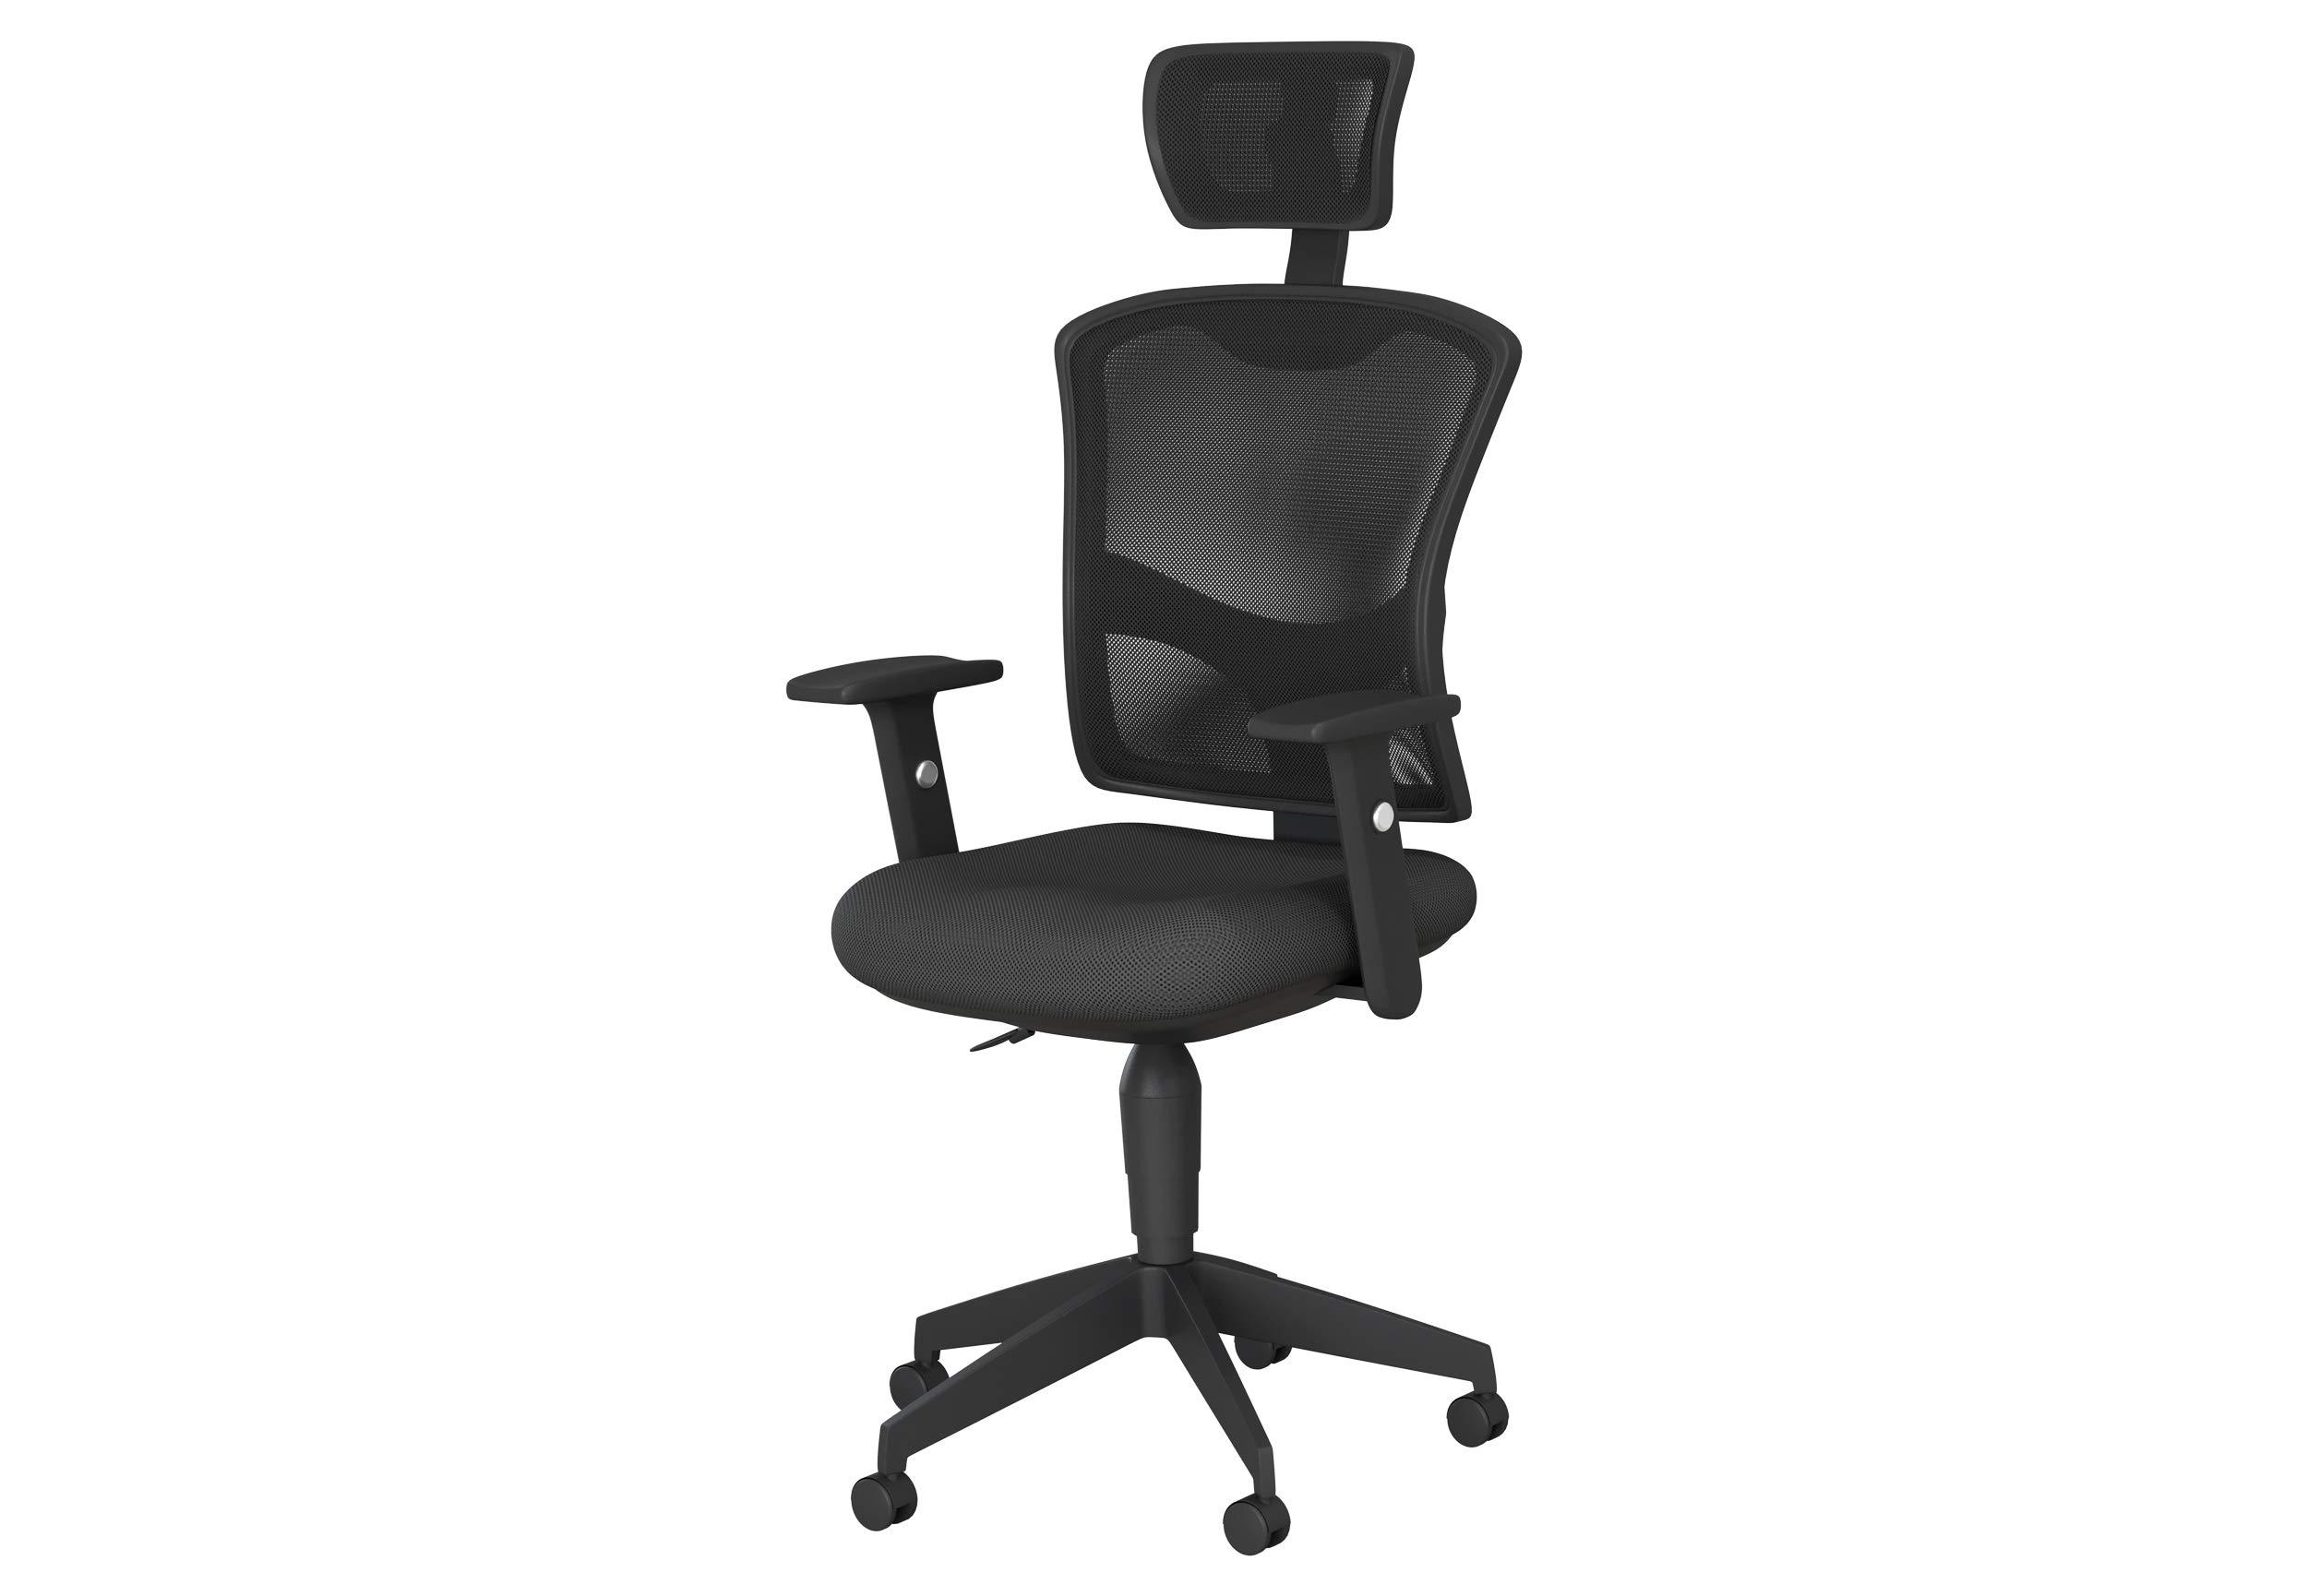 Safdie & Co. Ergonomic Office Home Chair, Black